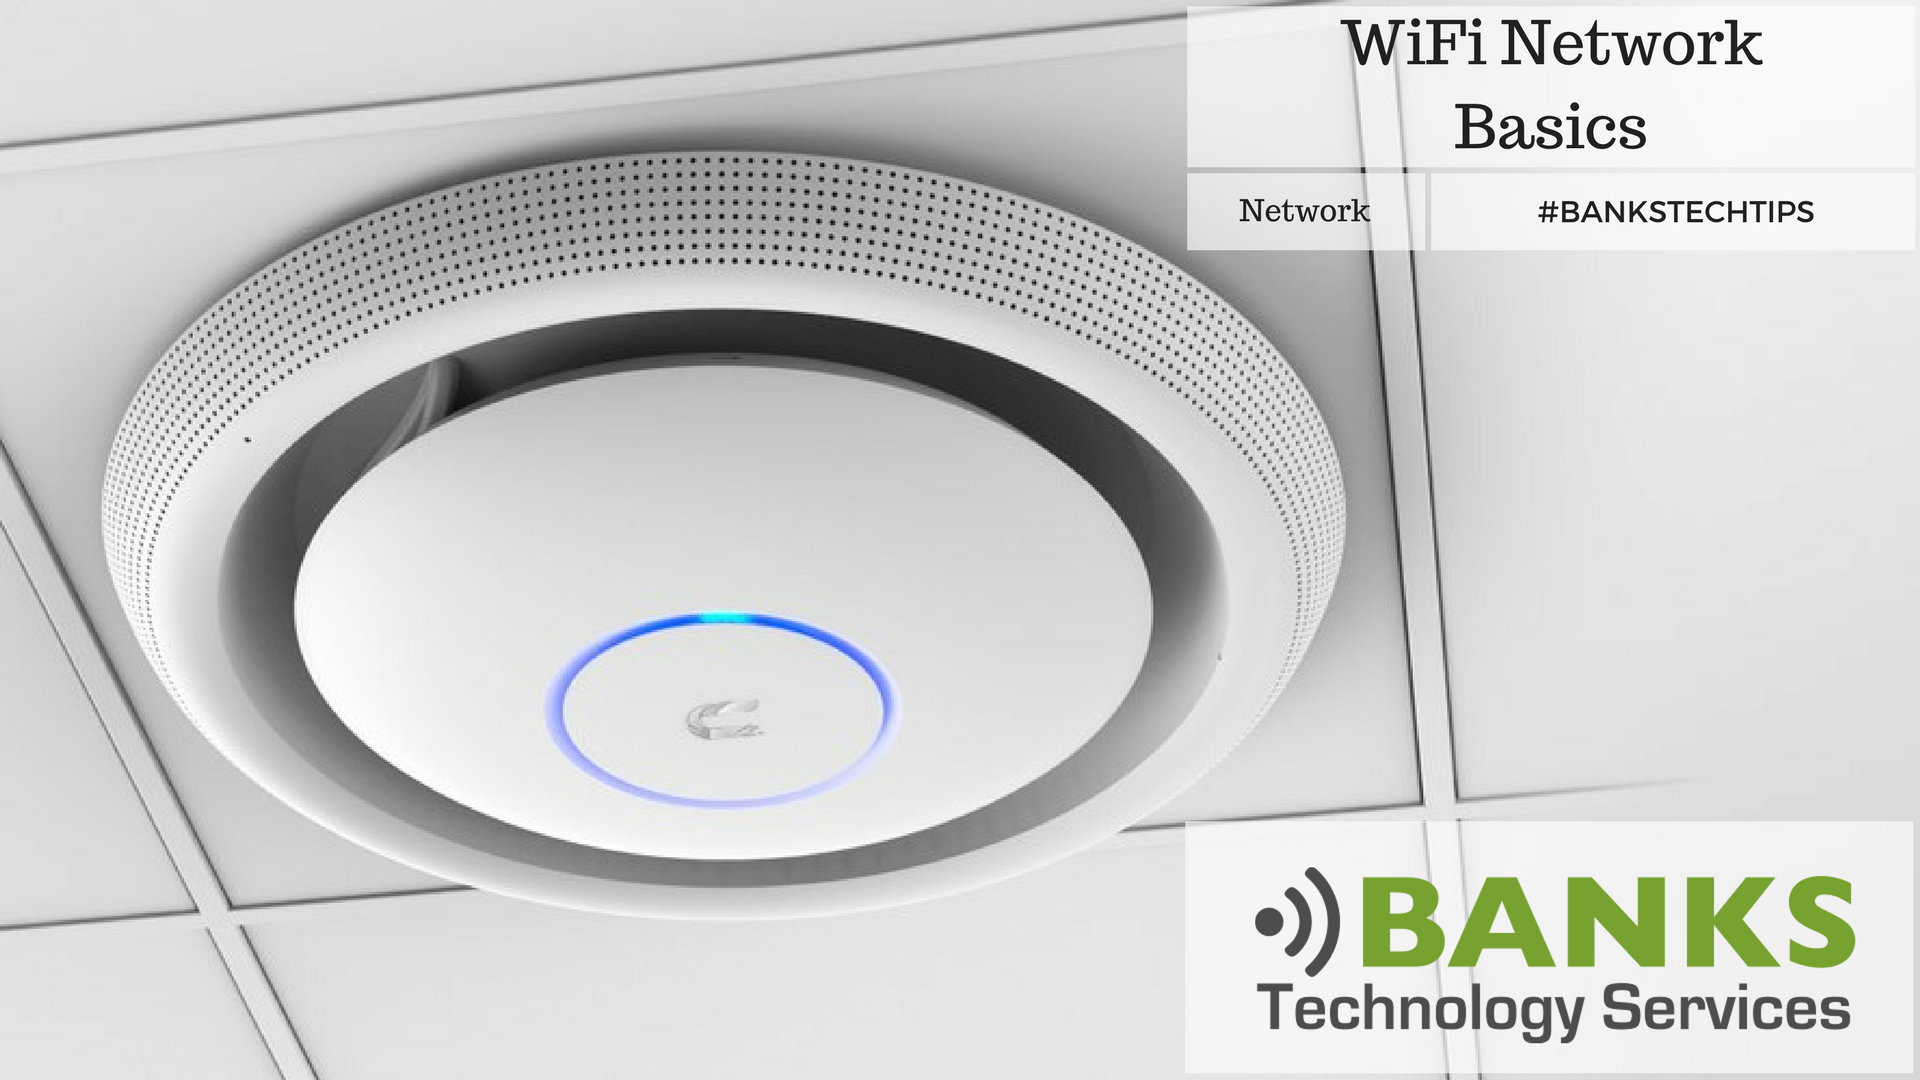 WiFi Network Basics